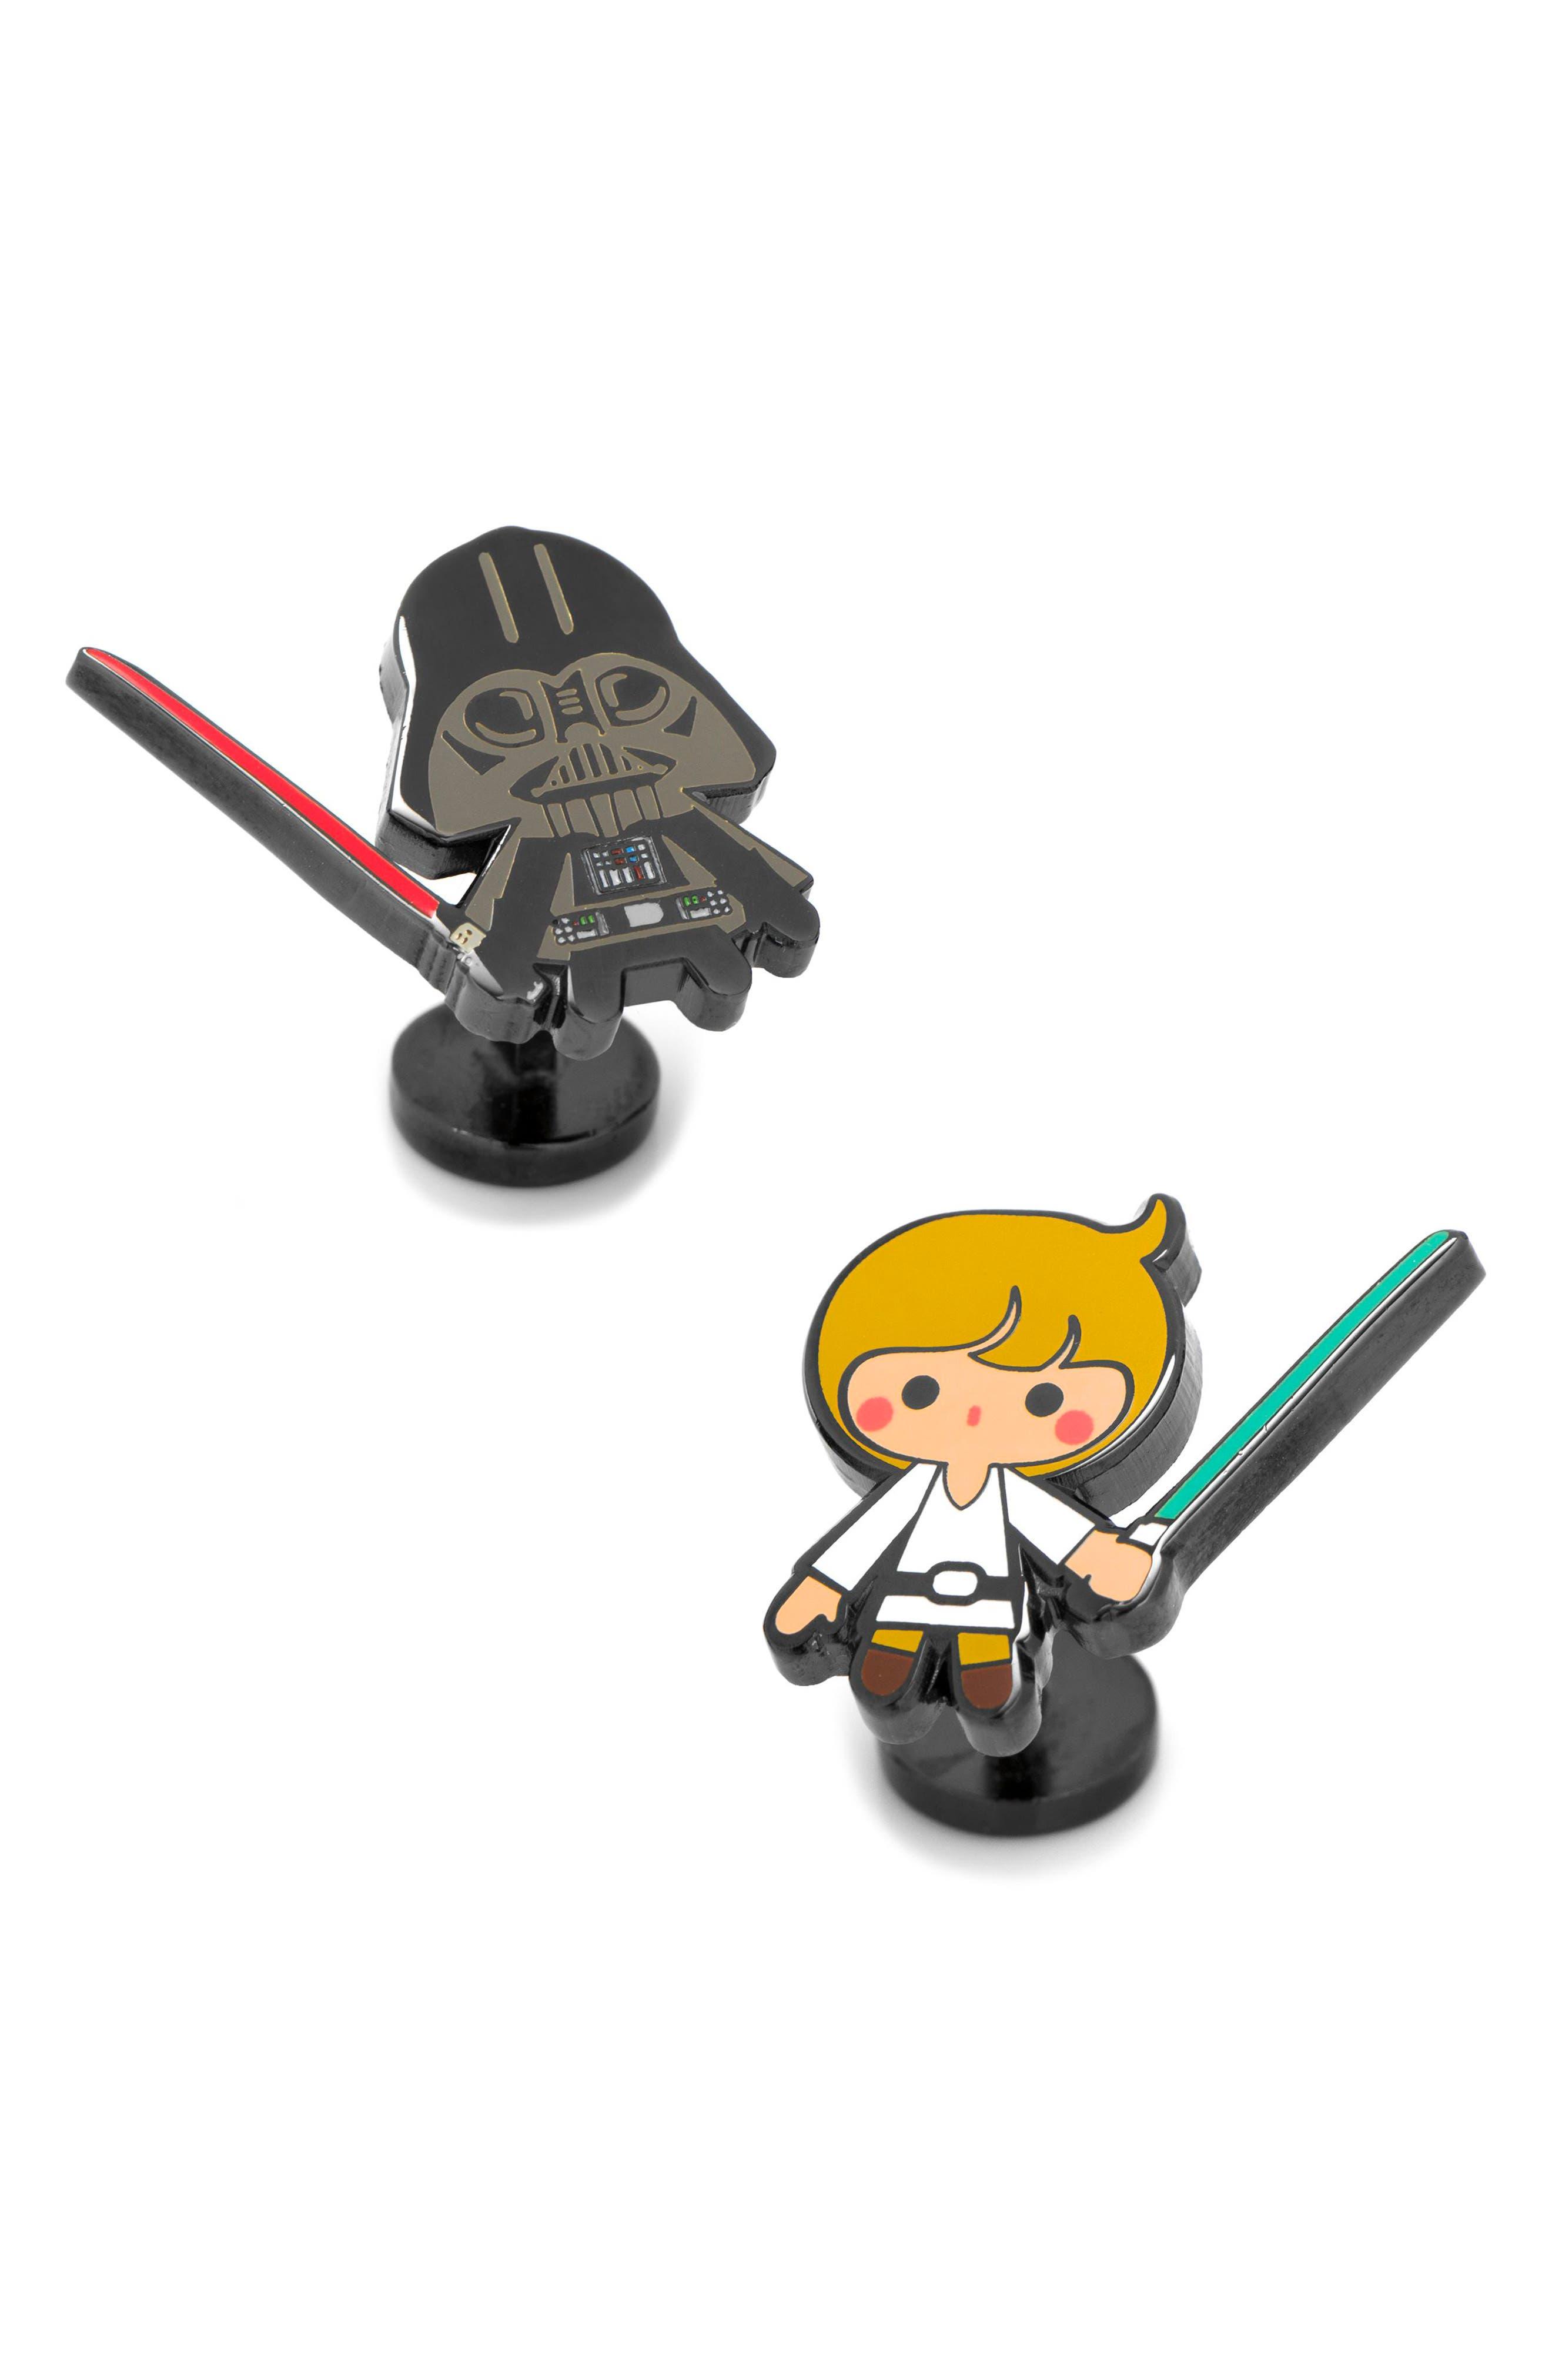 Luke & Darth Vader Cuff Links,                         Main,                         color, Black/ White